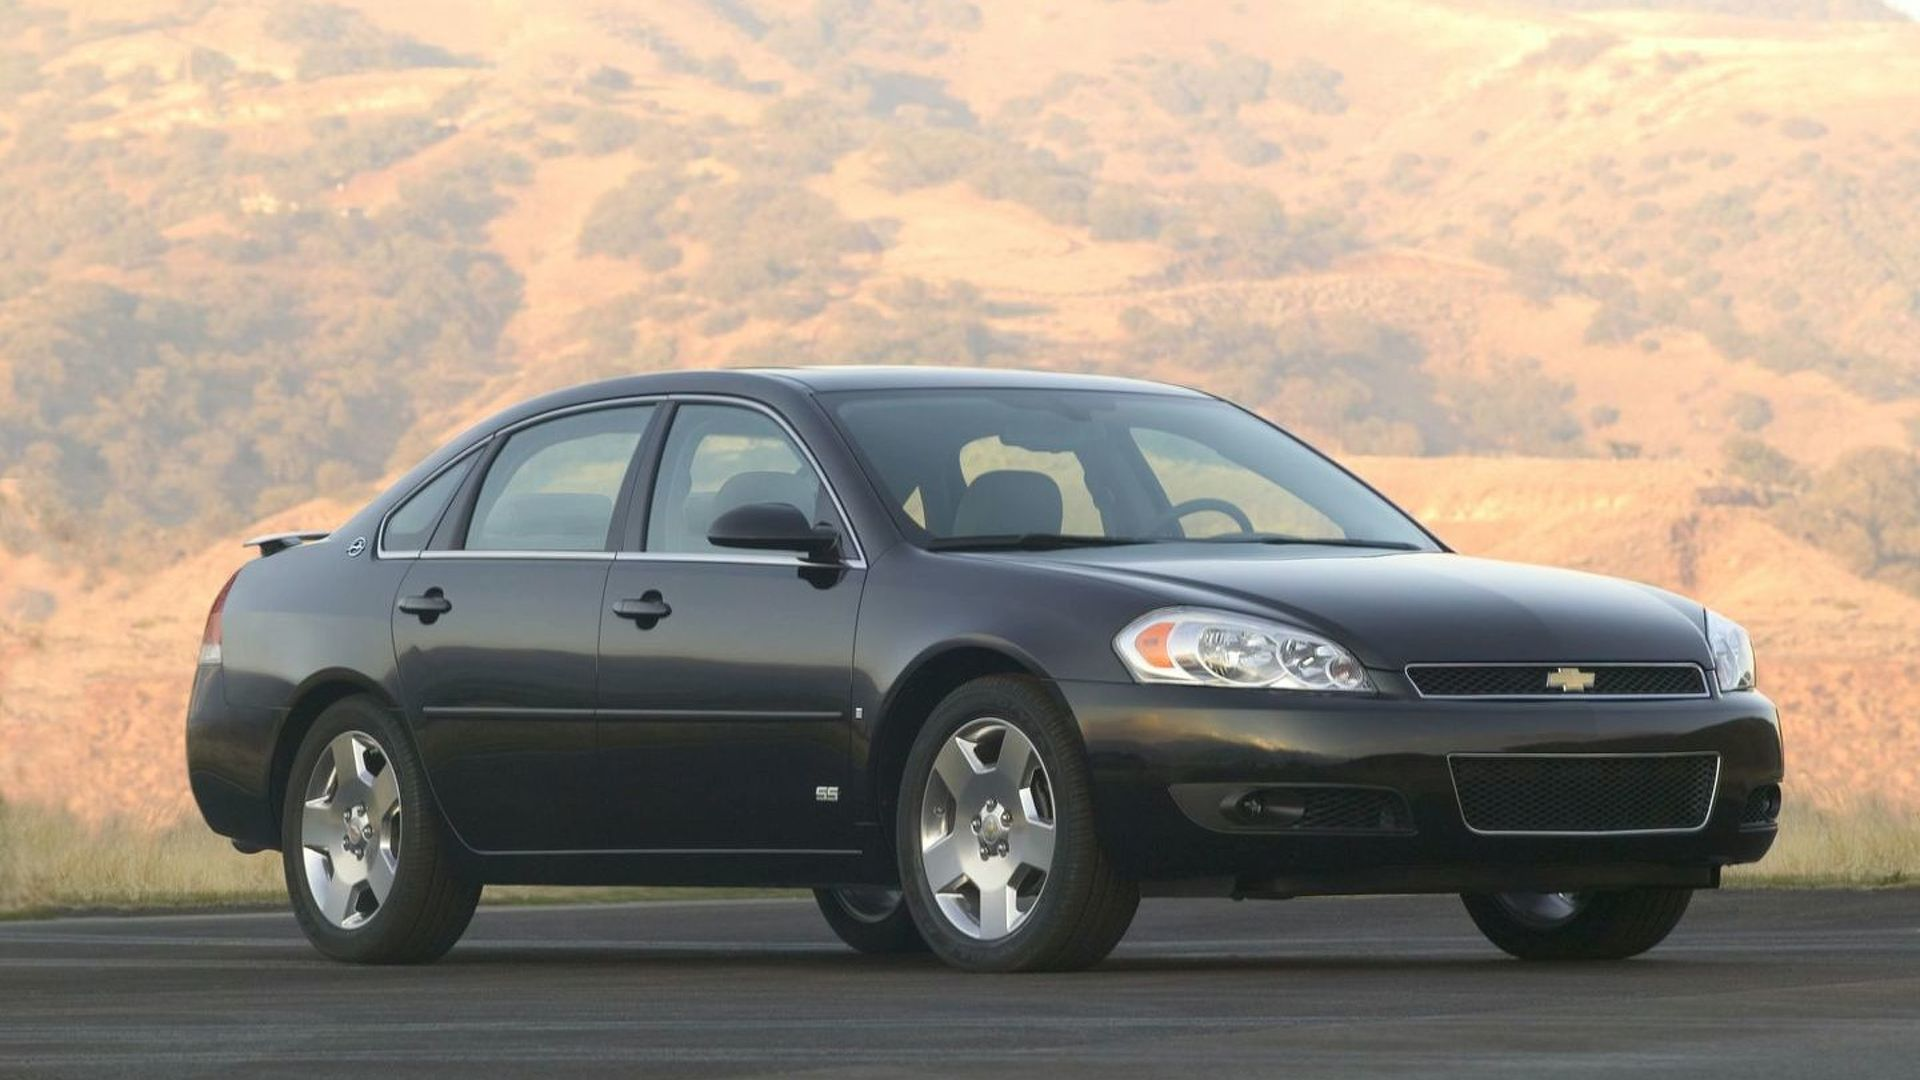 Chevy recalls 290k Impalas for failing sensor in passenger seat